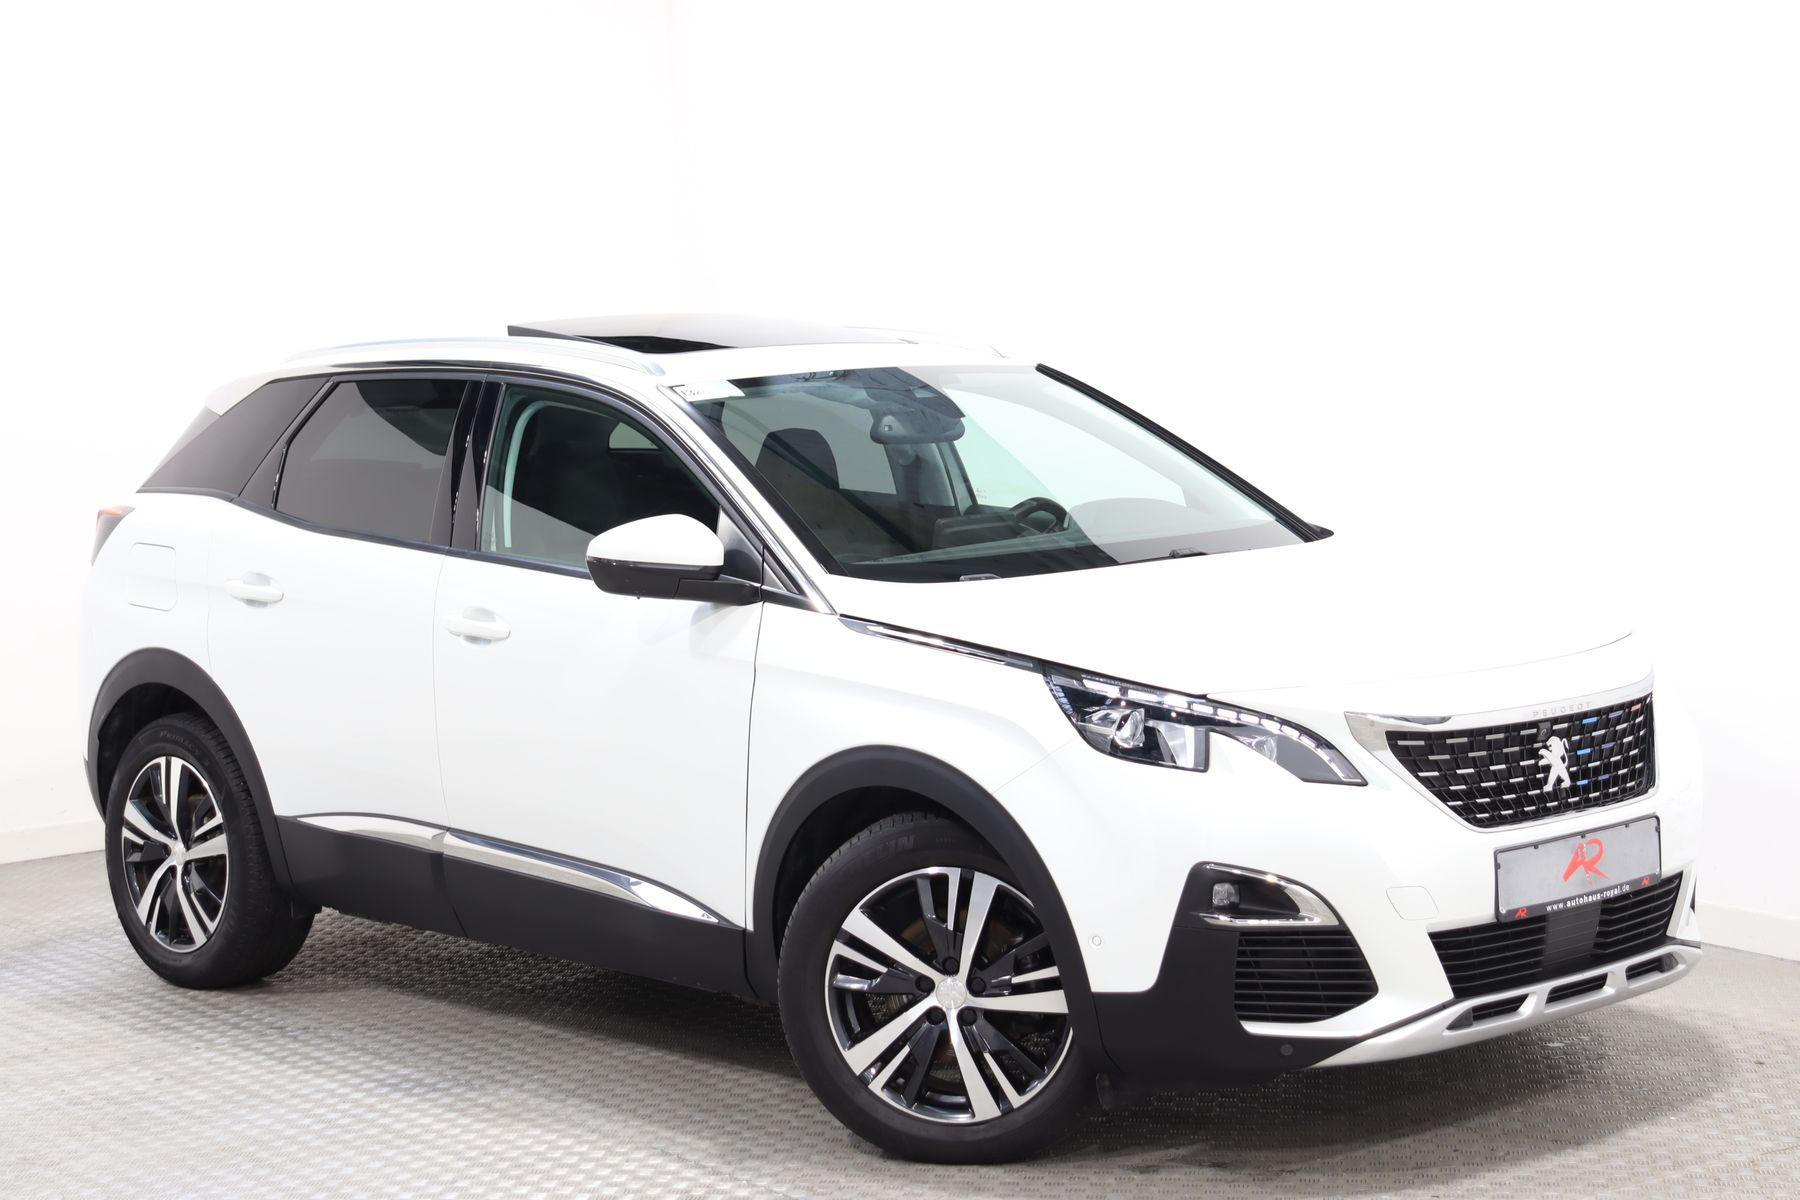 Peugeot 3008 2.0 BlueHDi ALLURE PANORAMA,TOTWINKEL,LED, Jahr 2018, Diesel